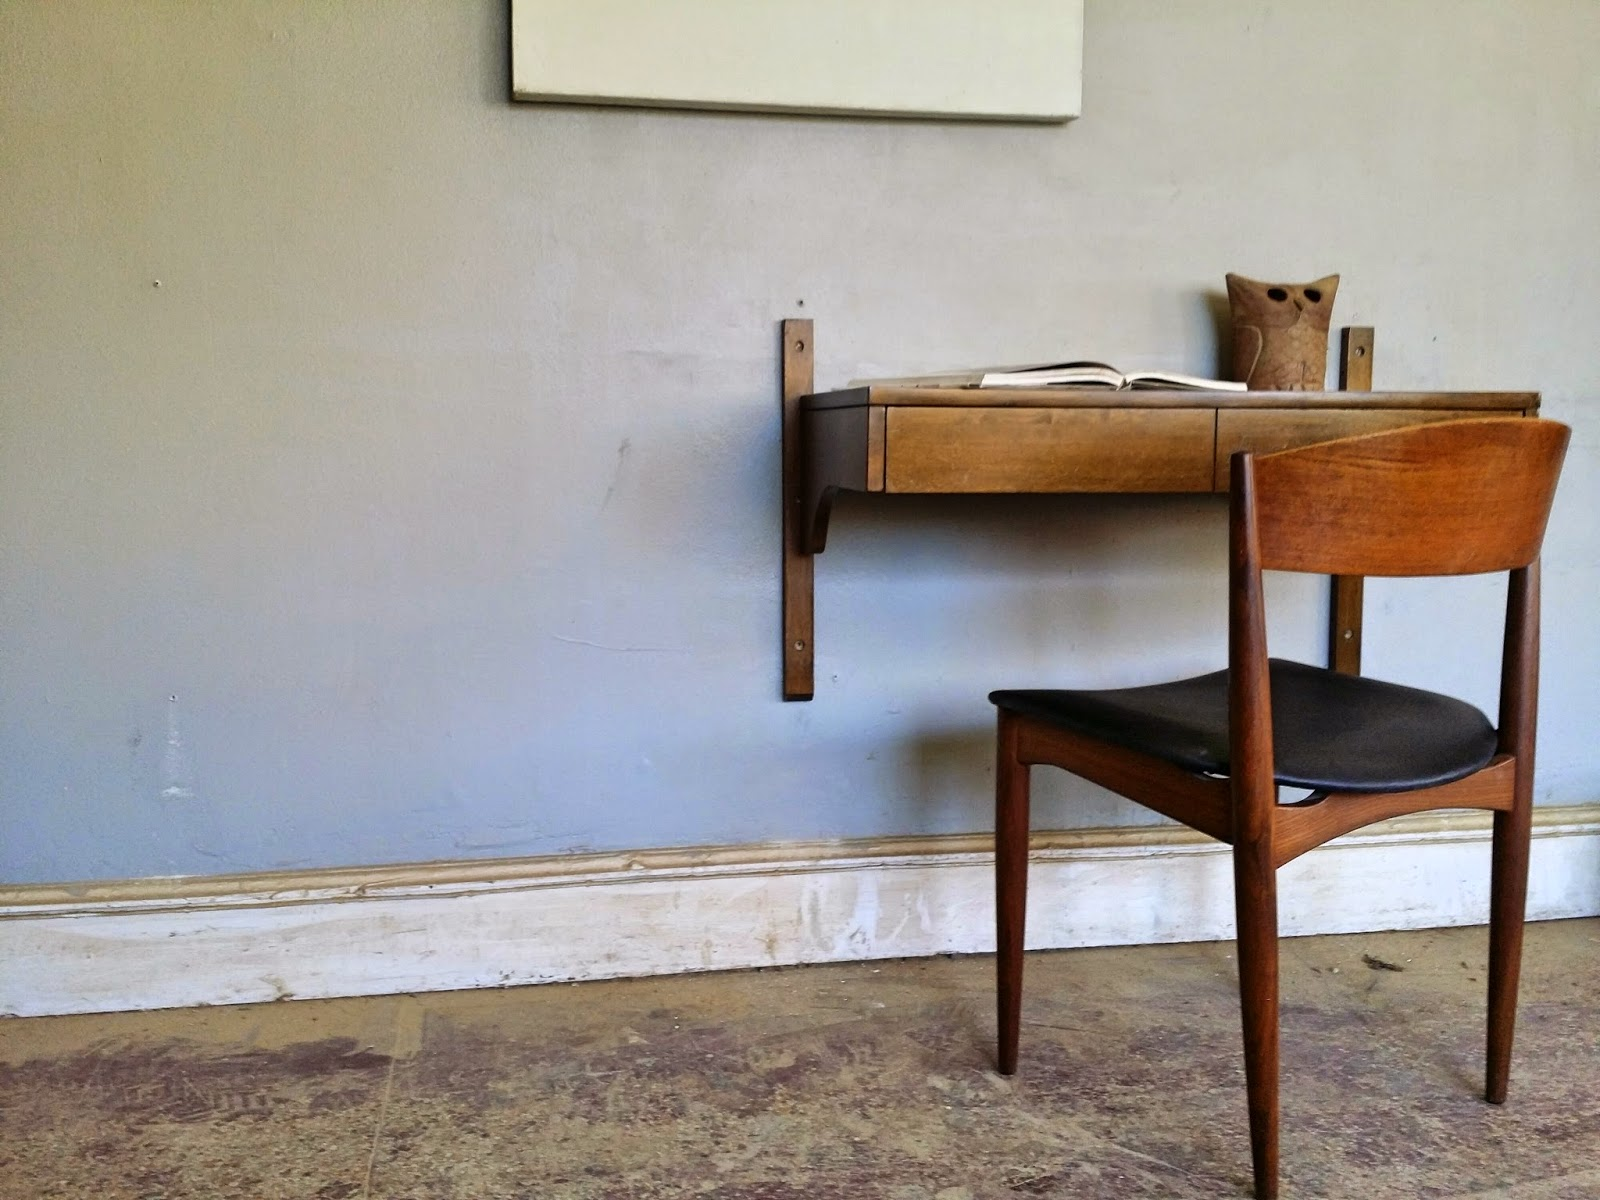 Vintage Ground Mid Century Floating Table Desk